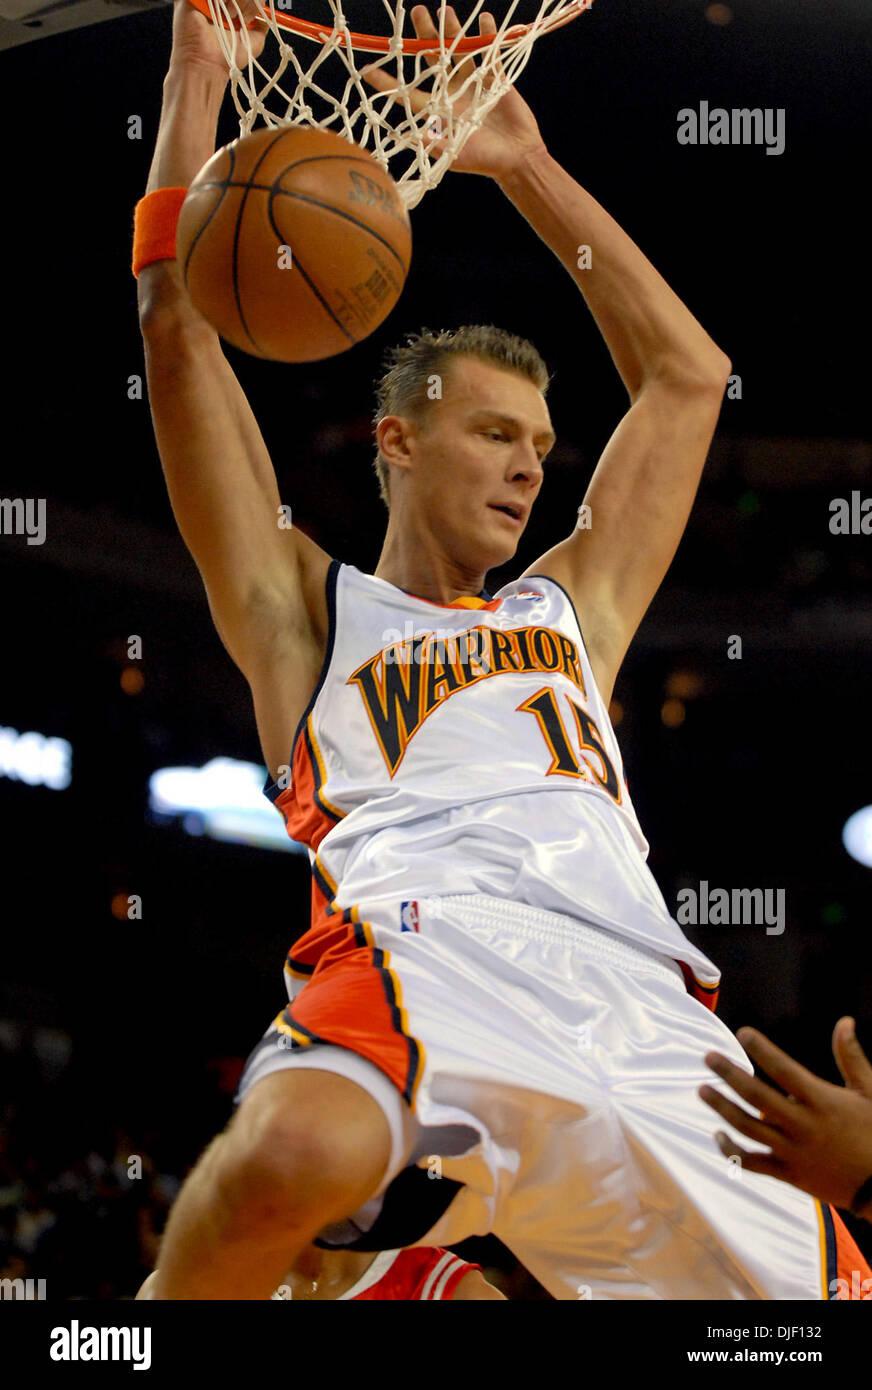 Warriors Center Andris Biedrins Slams A Basket During Their Game Thursday Nov